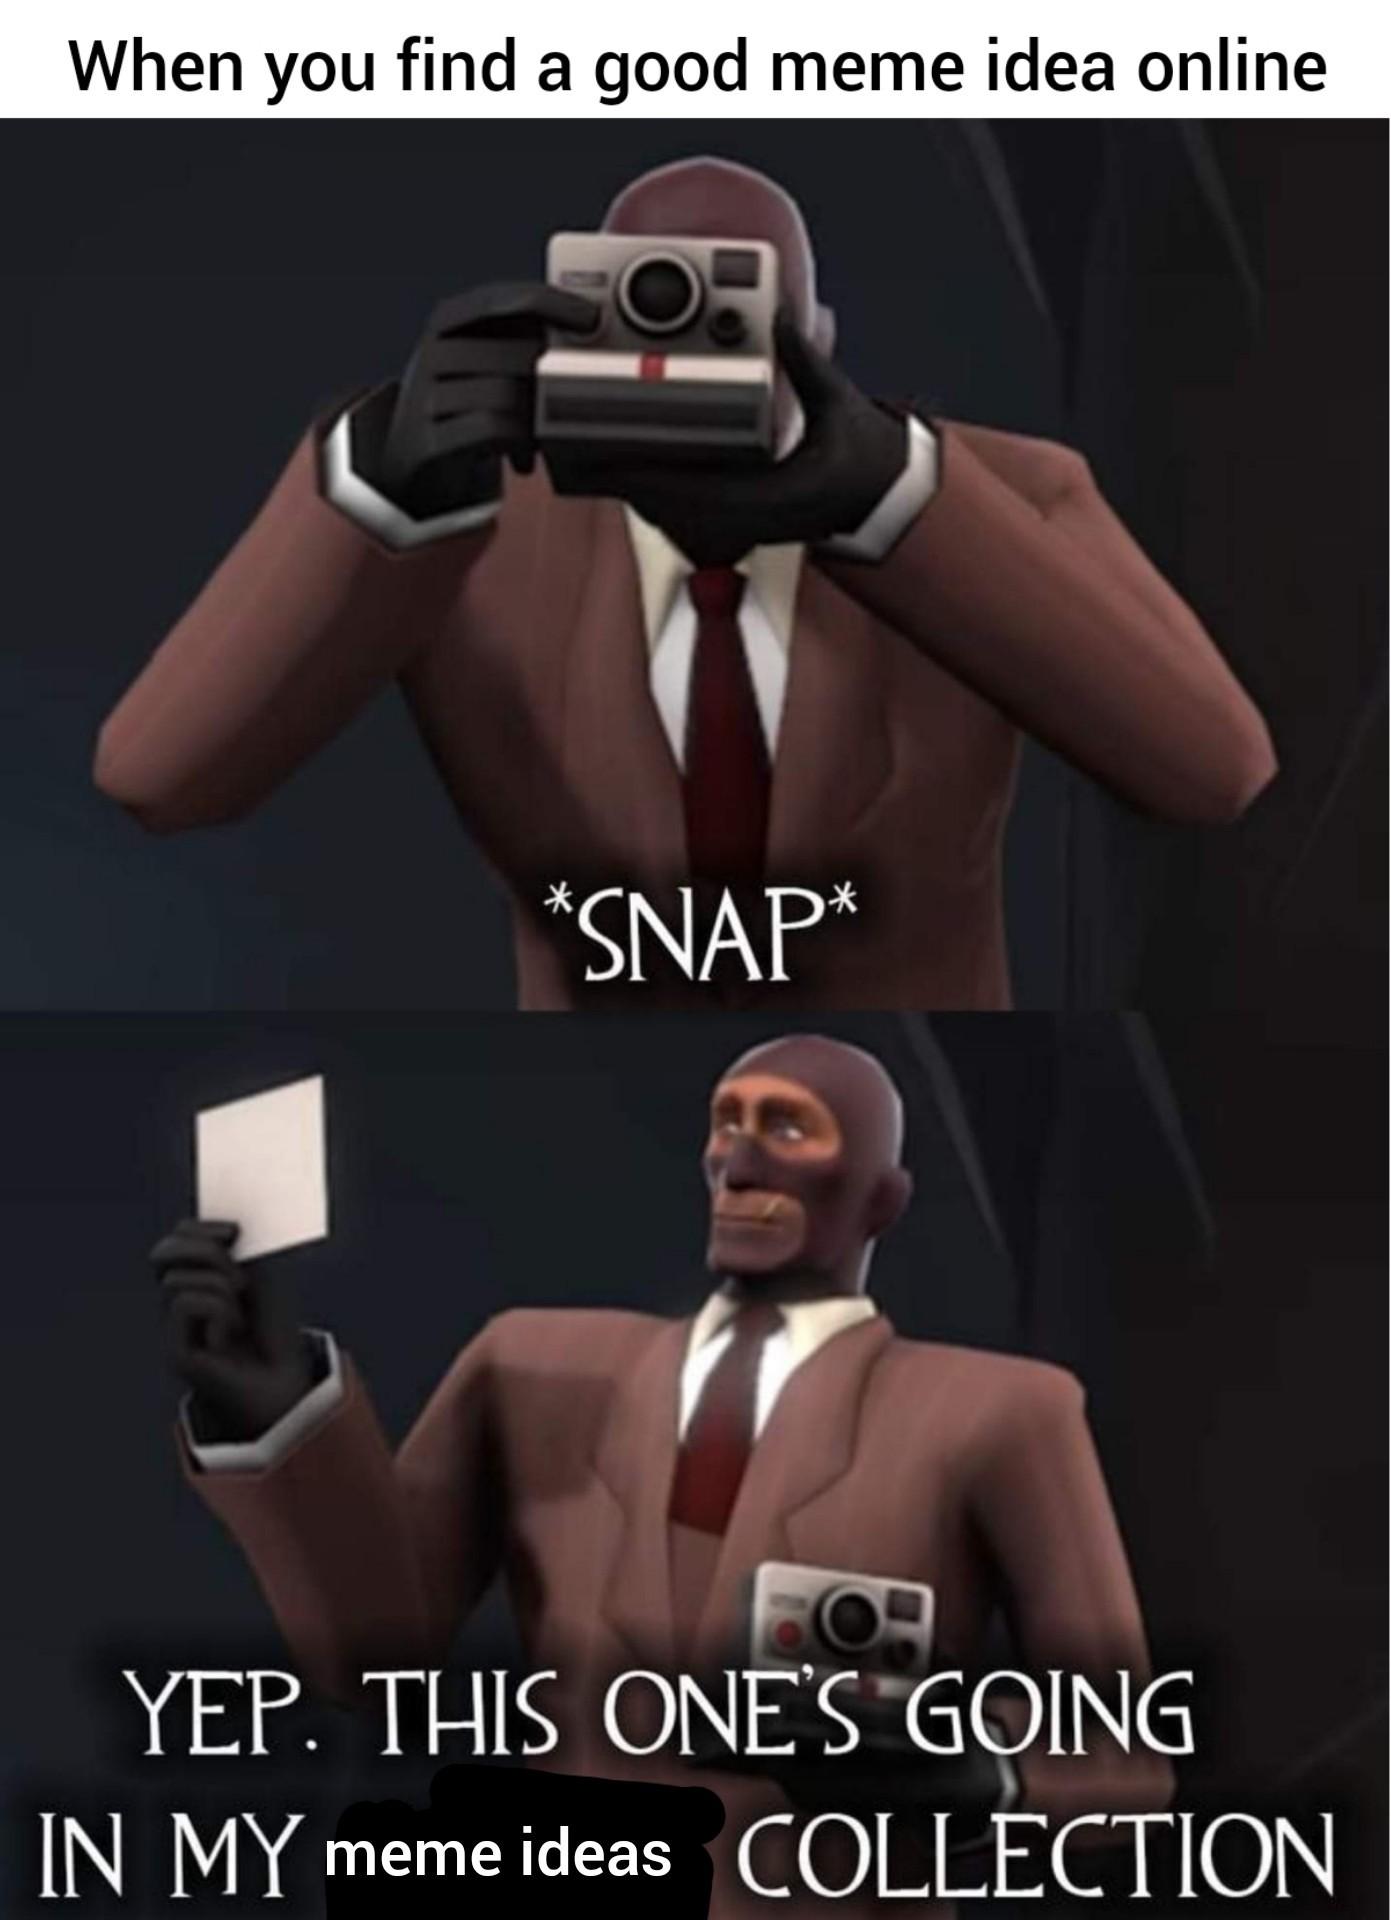 Basically how a meme is made